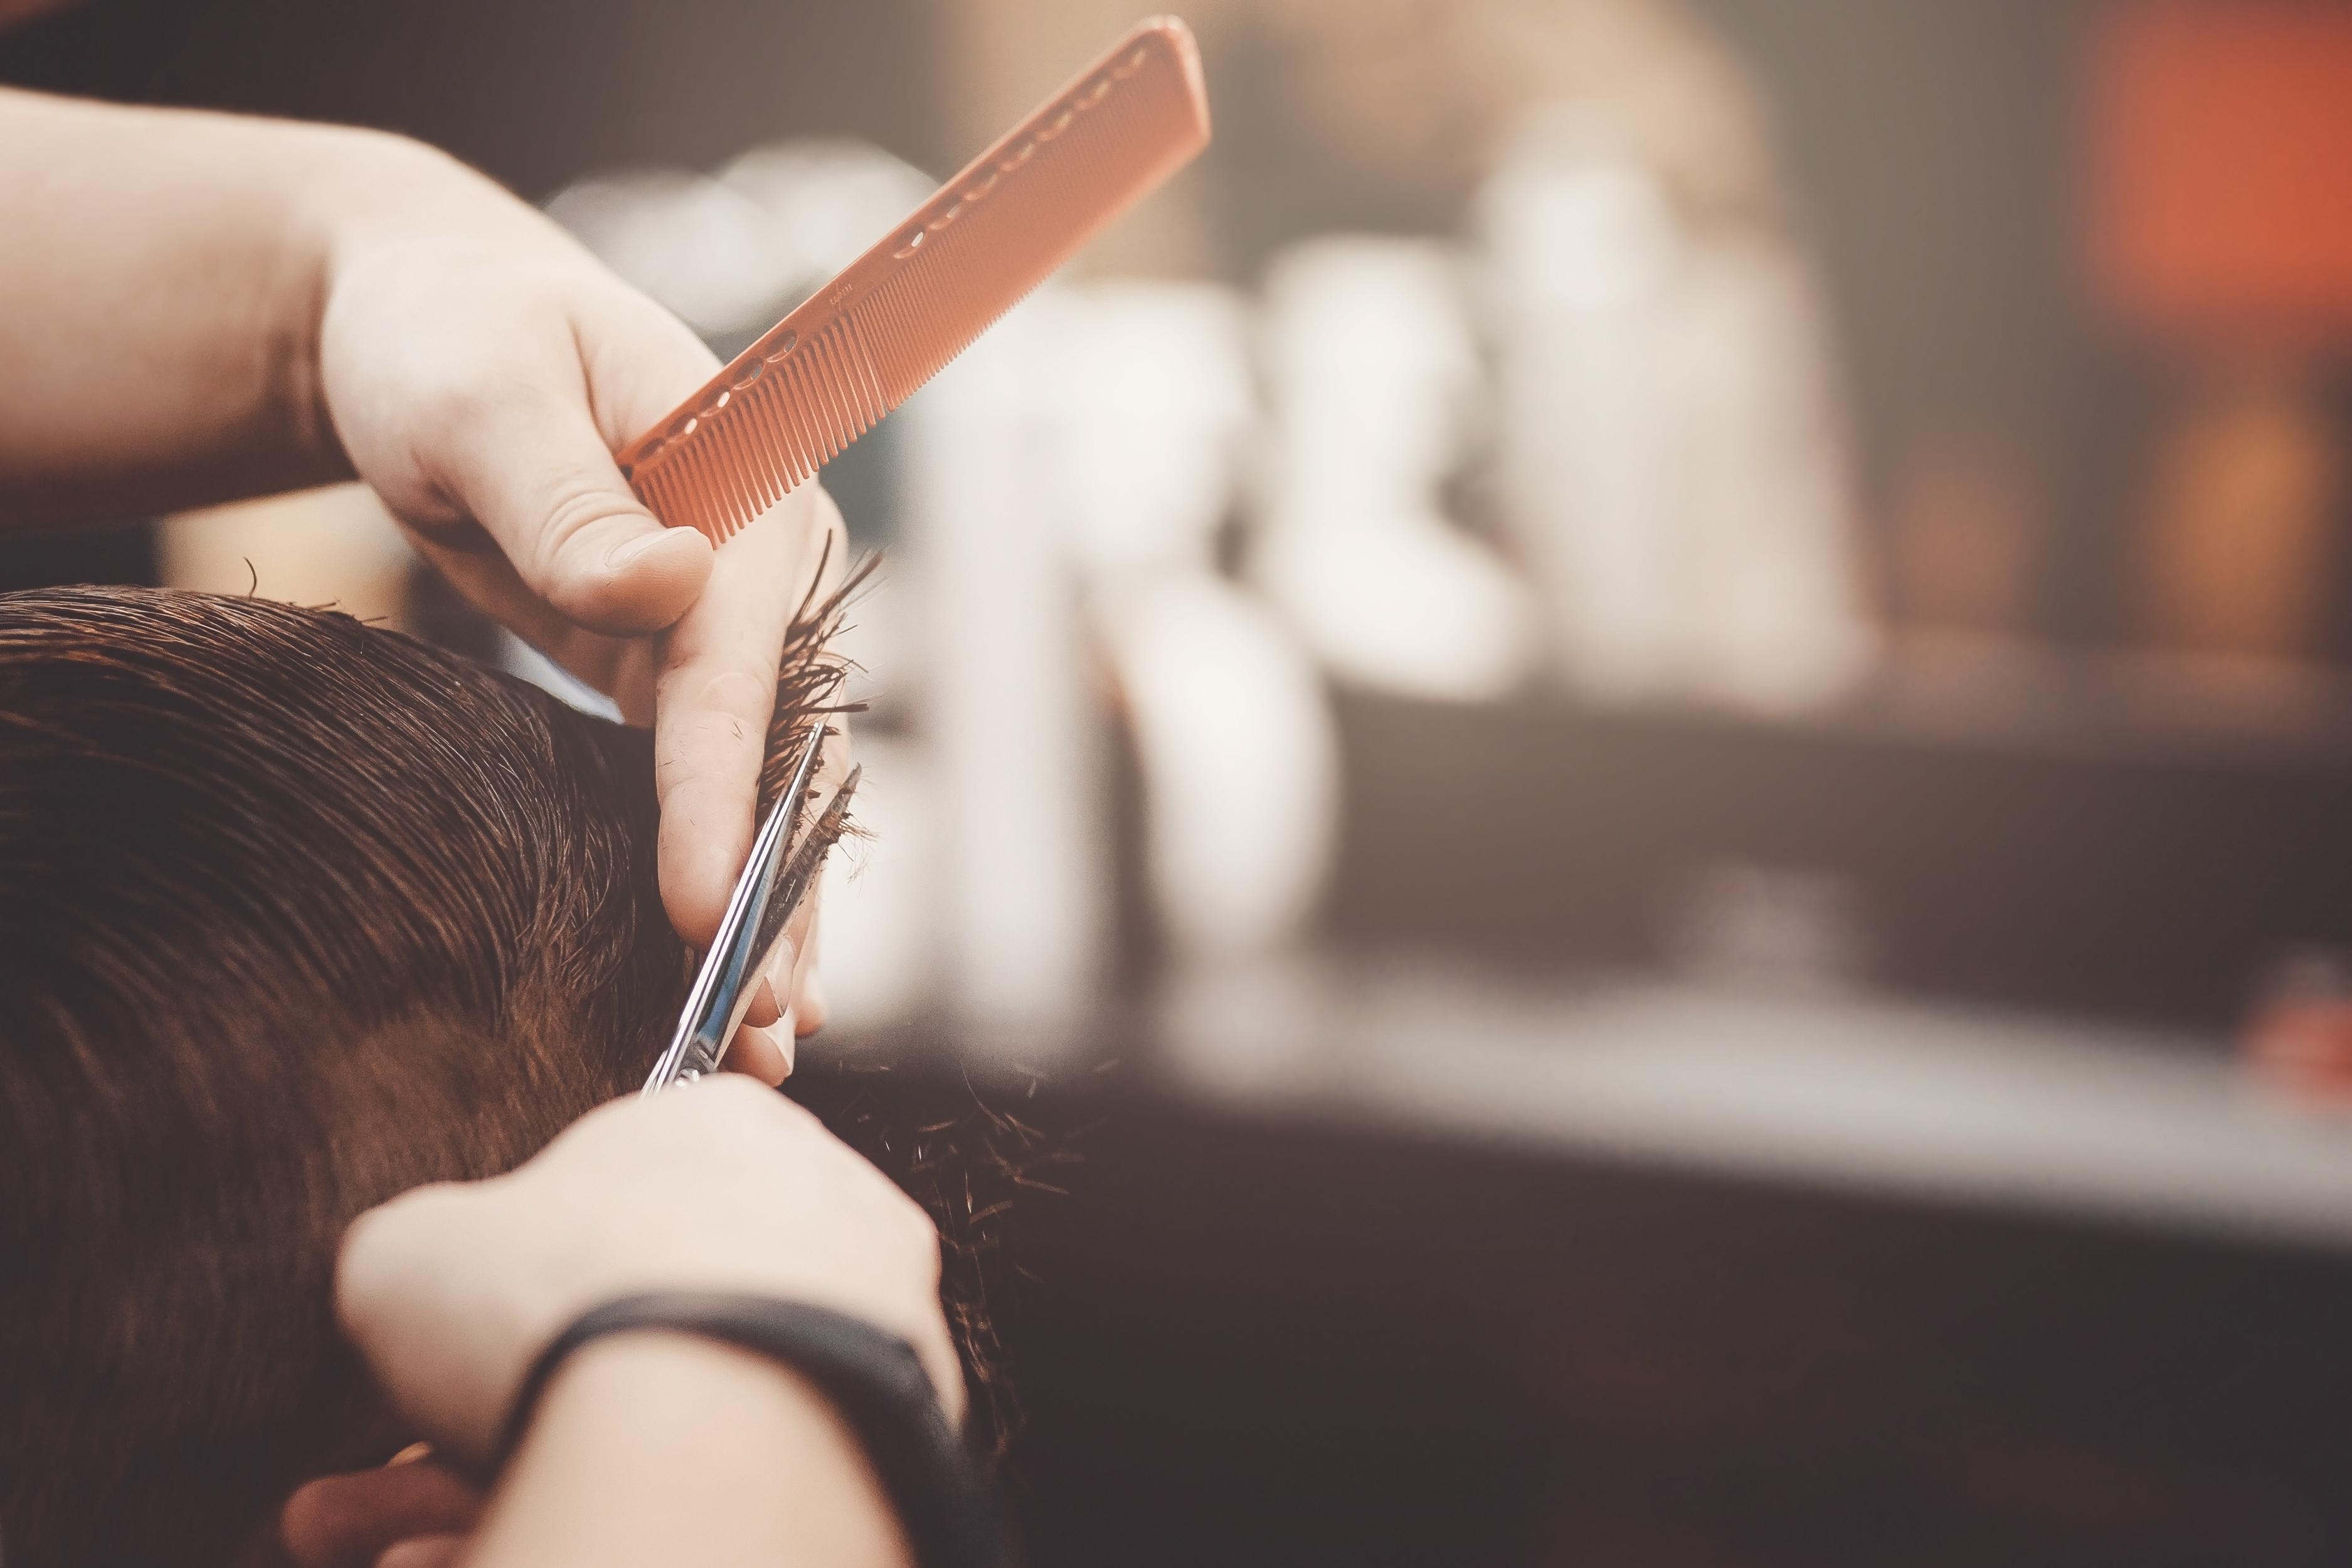 Muscat Municipality sets new regulations for barber shops